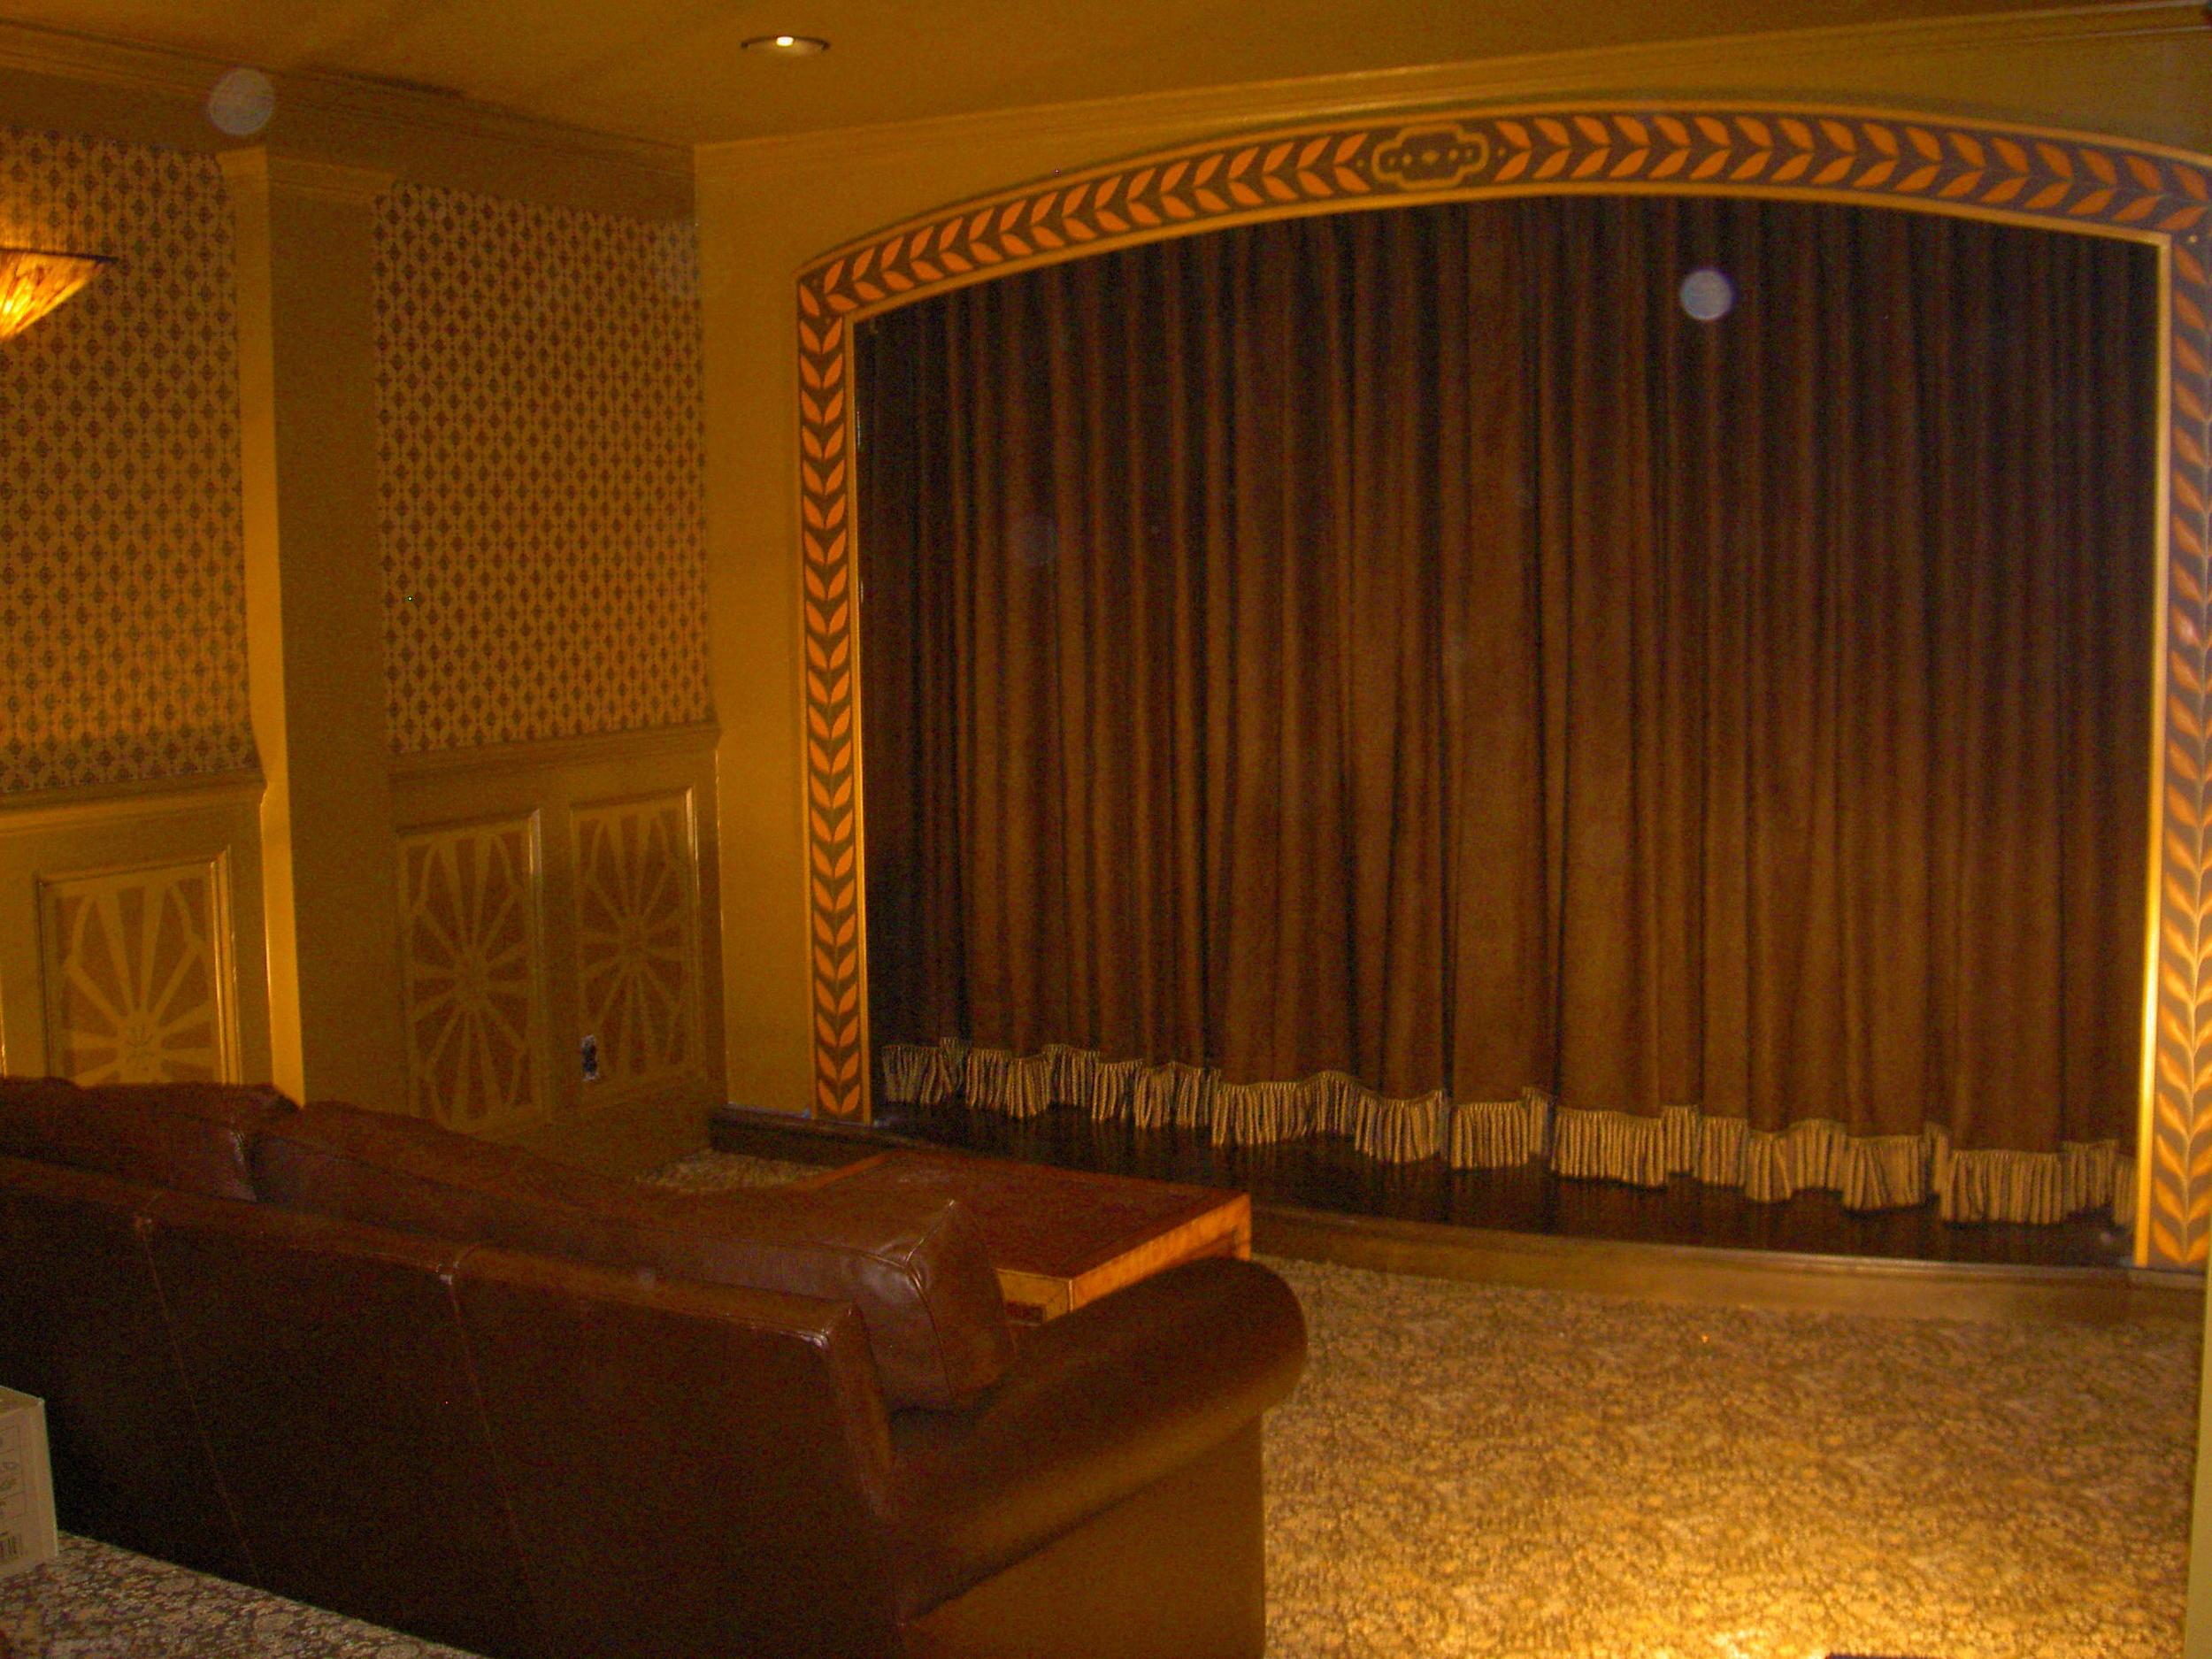 hoepker theatre.jpg